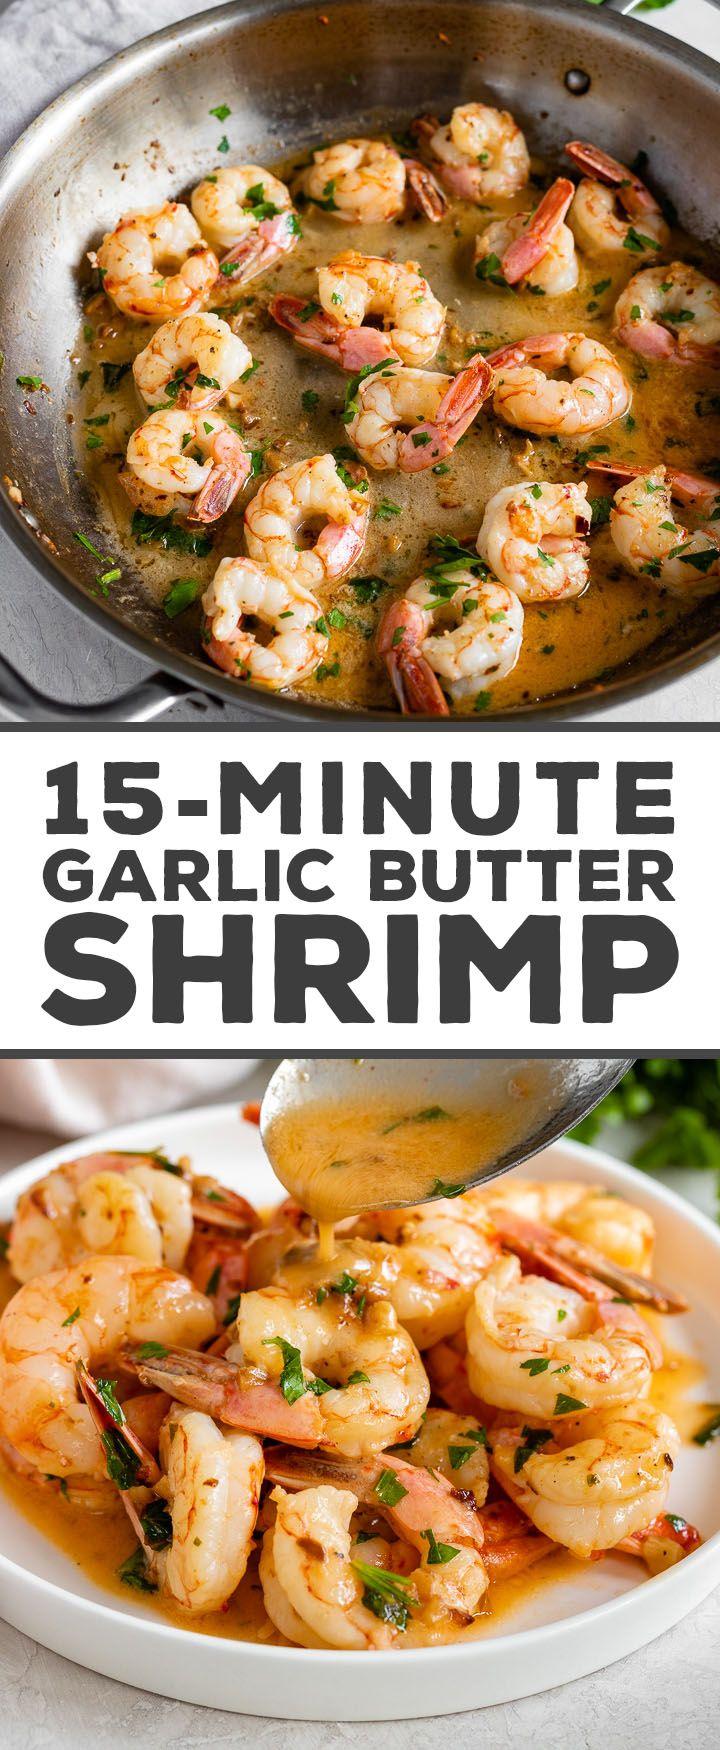 15-Minute Garlic Butter Shrimp